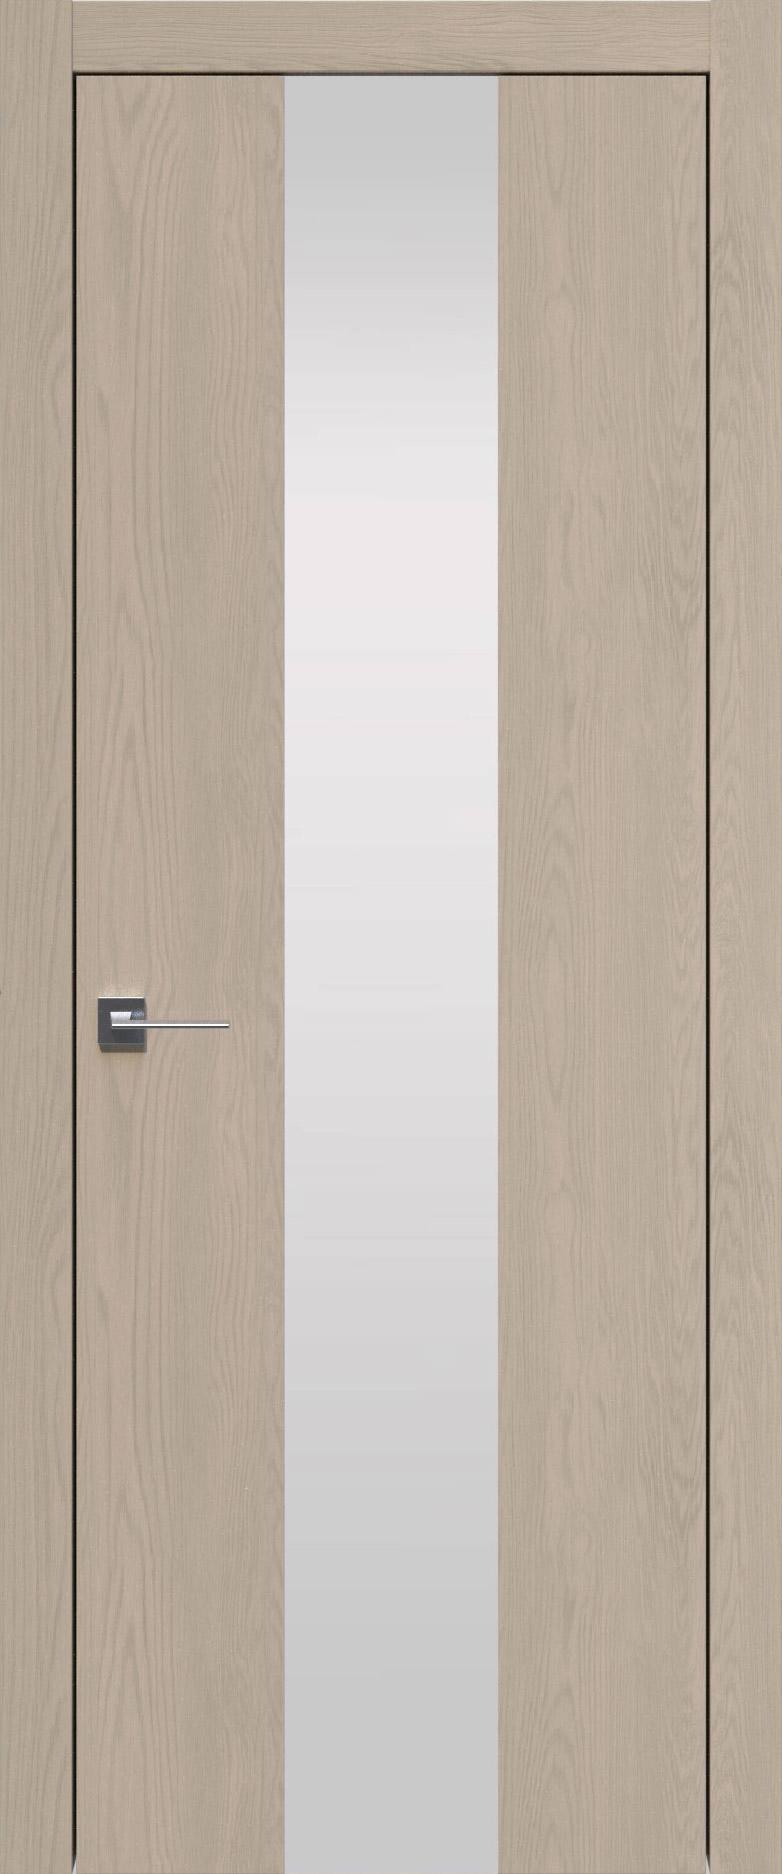 Tivoli Ж-1 цвет - Дуб муар Со стеклом (ДО)